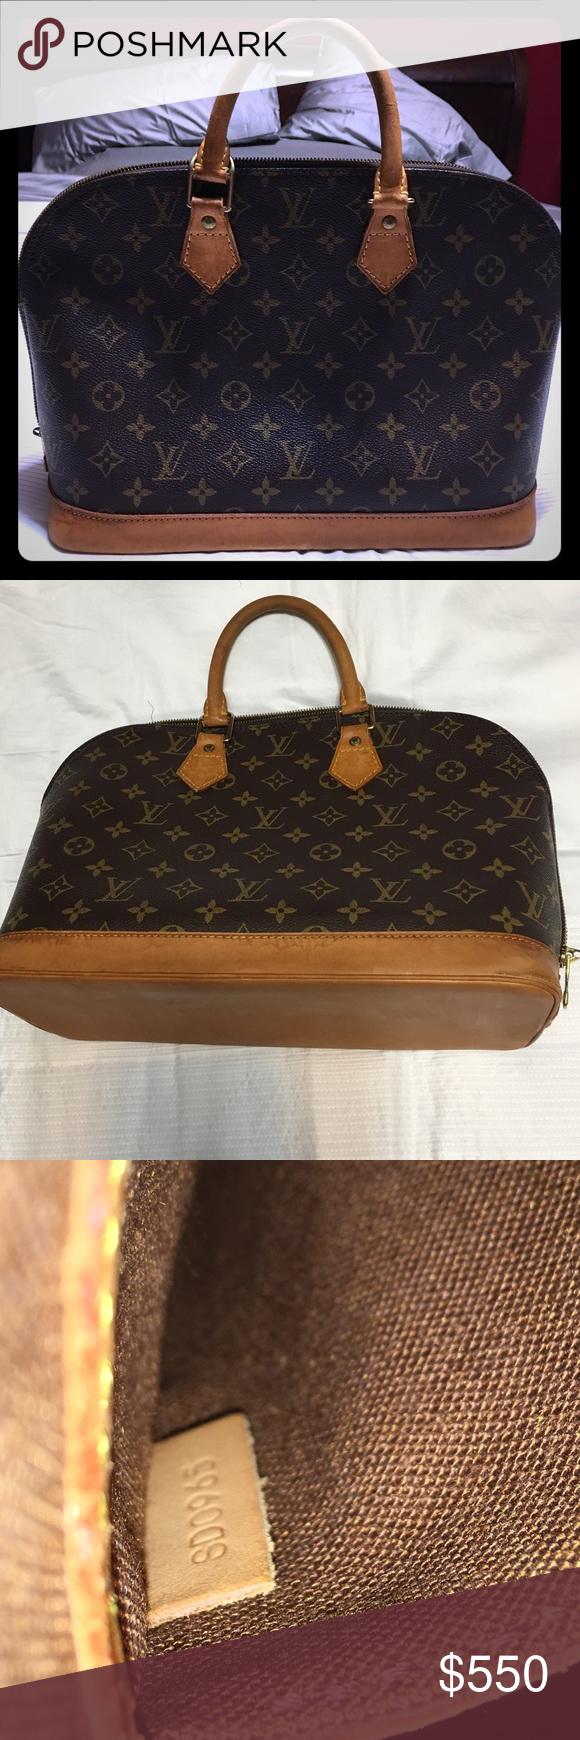 authentic Louis Vuitton Alma pm Such a beautiful bag! Authentic LV Alma pm. 84b7e02a09